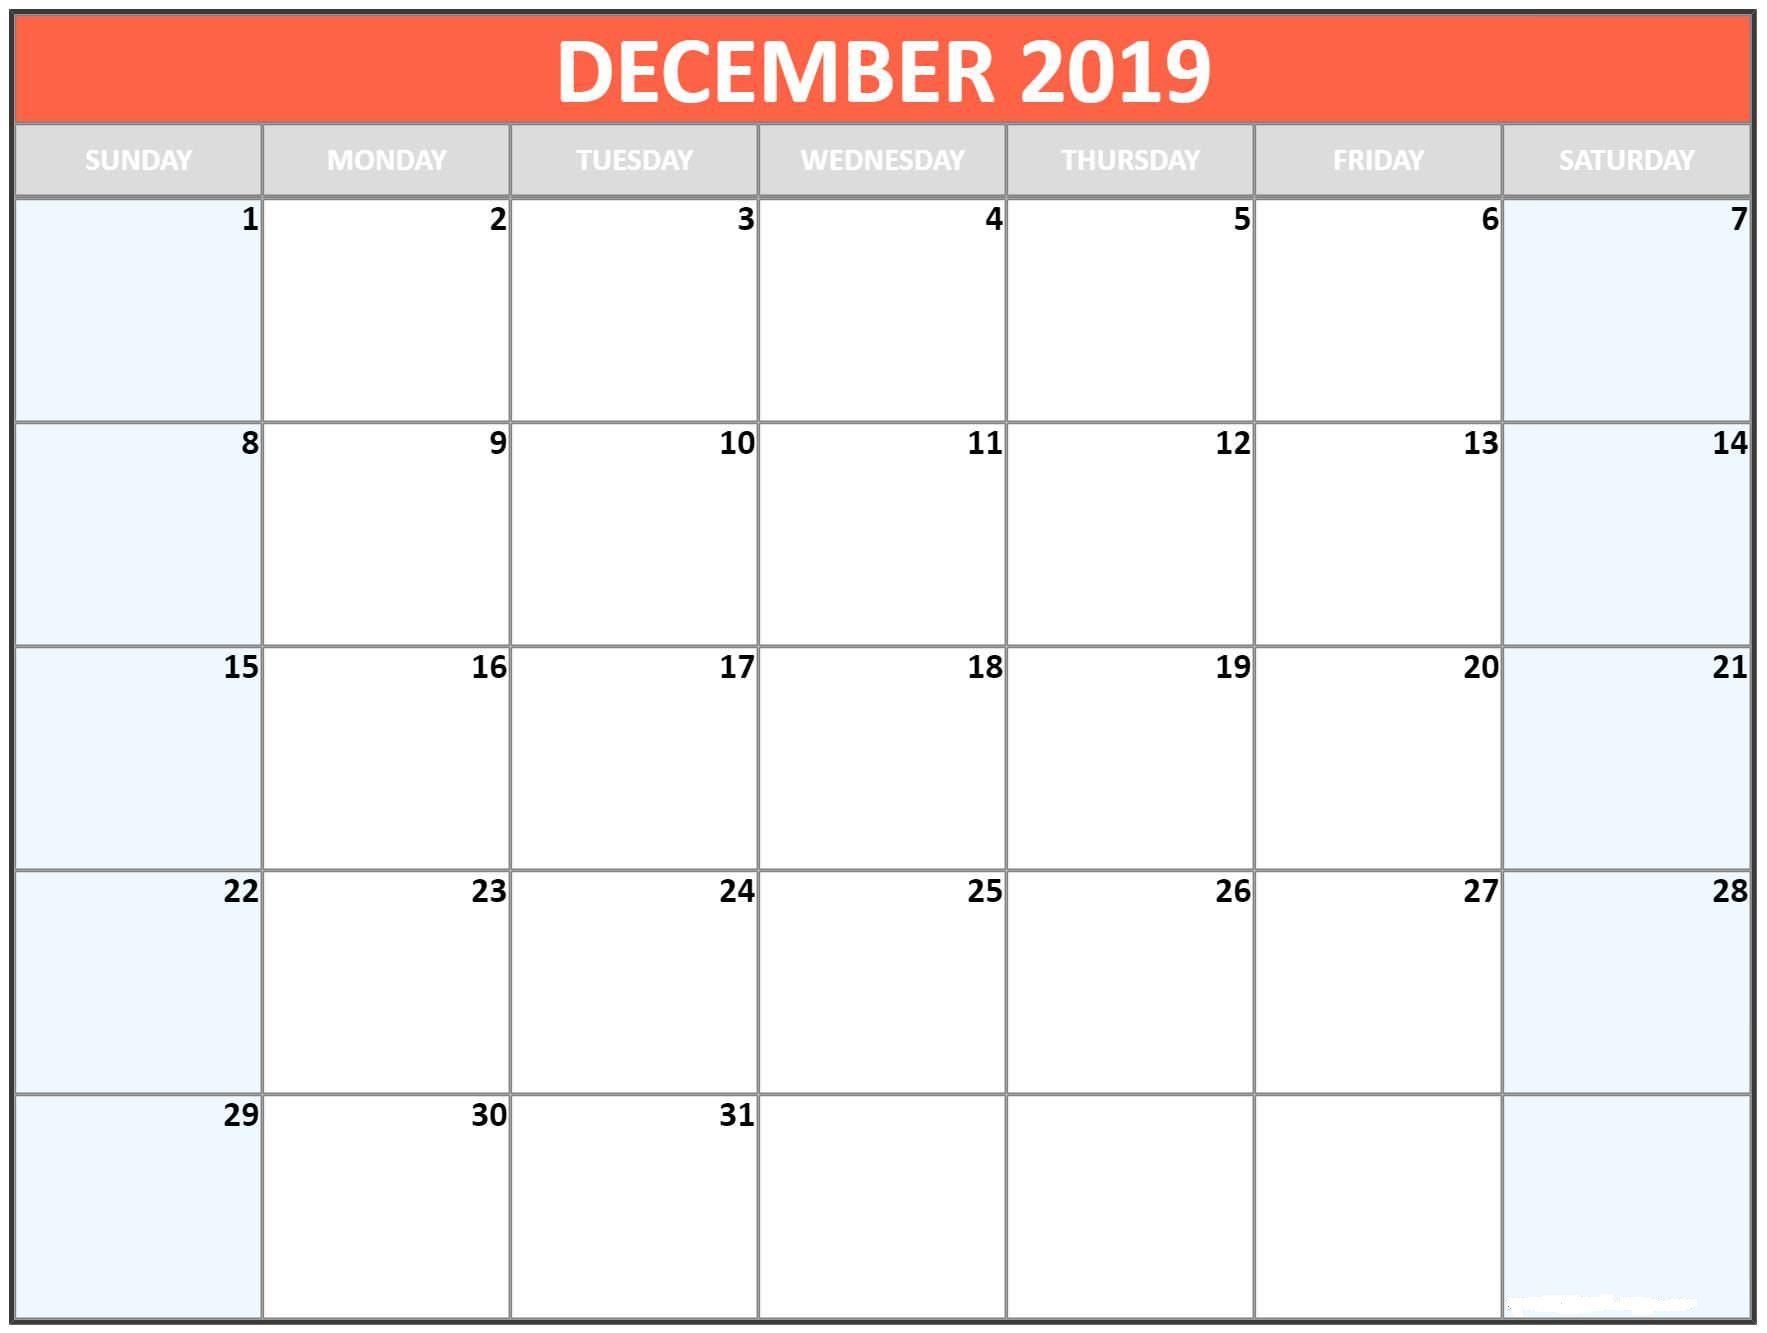 December 2019 Printable Calendar